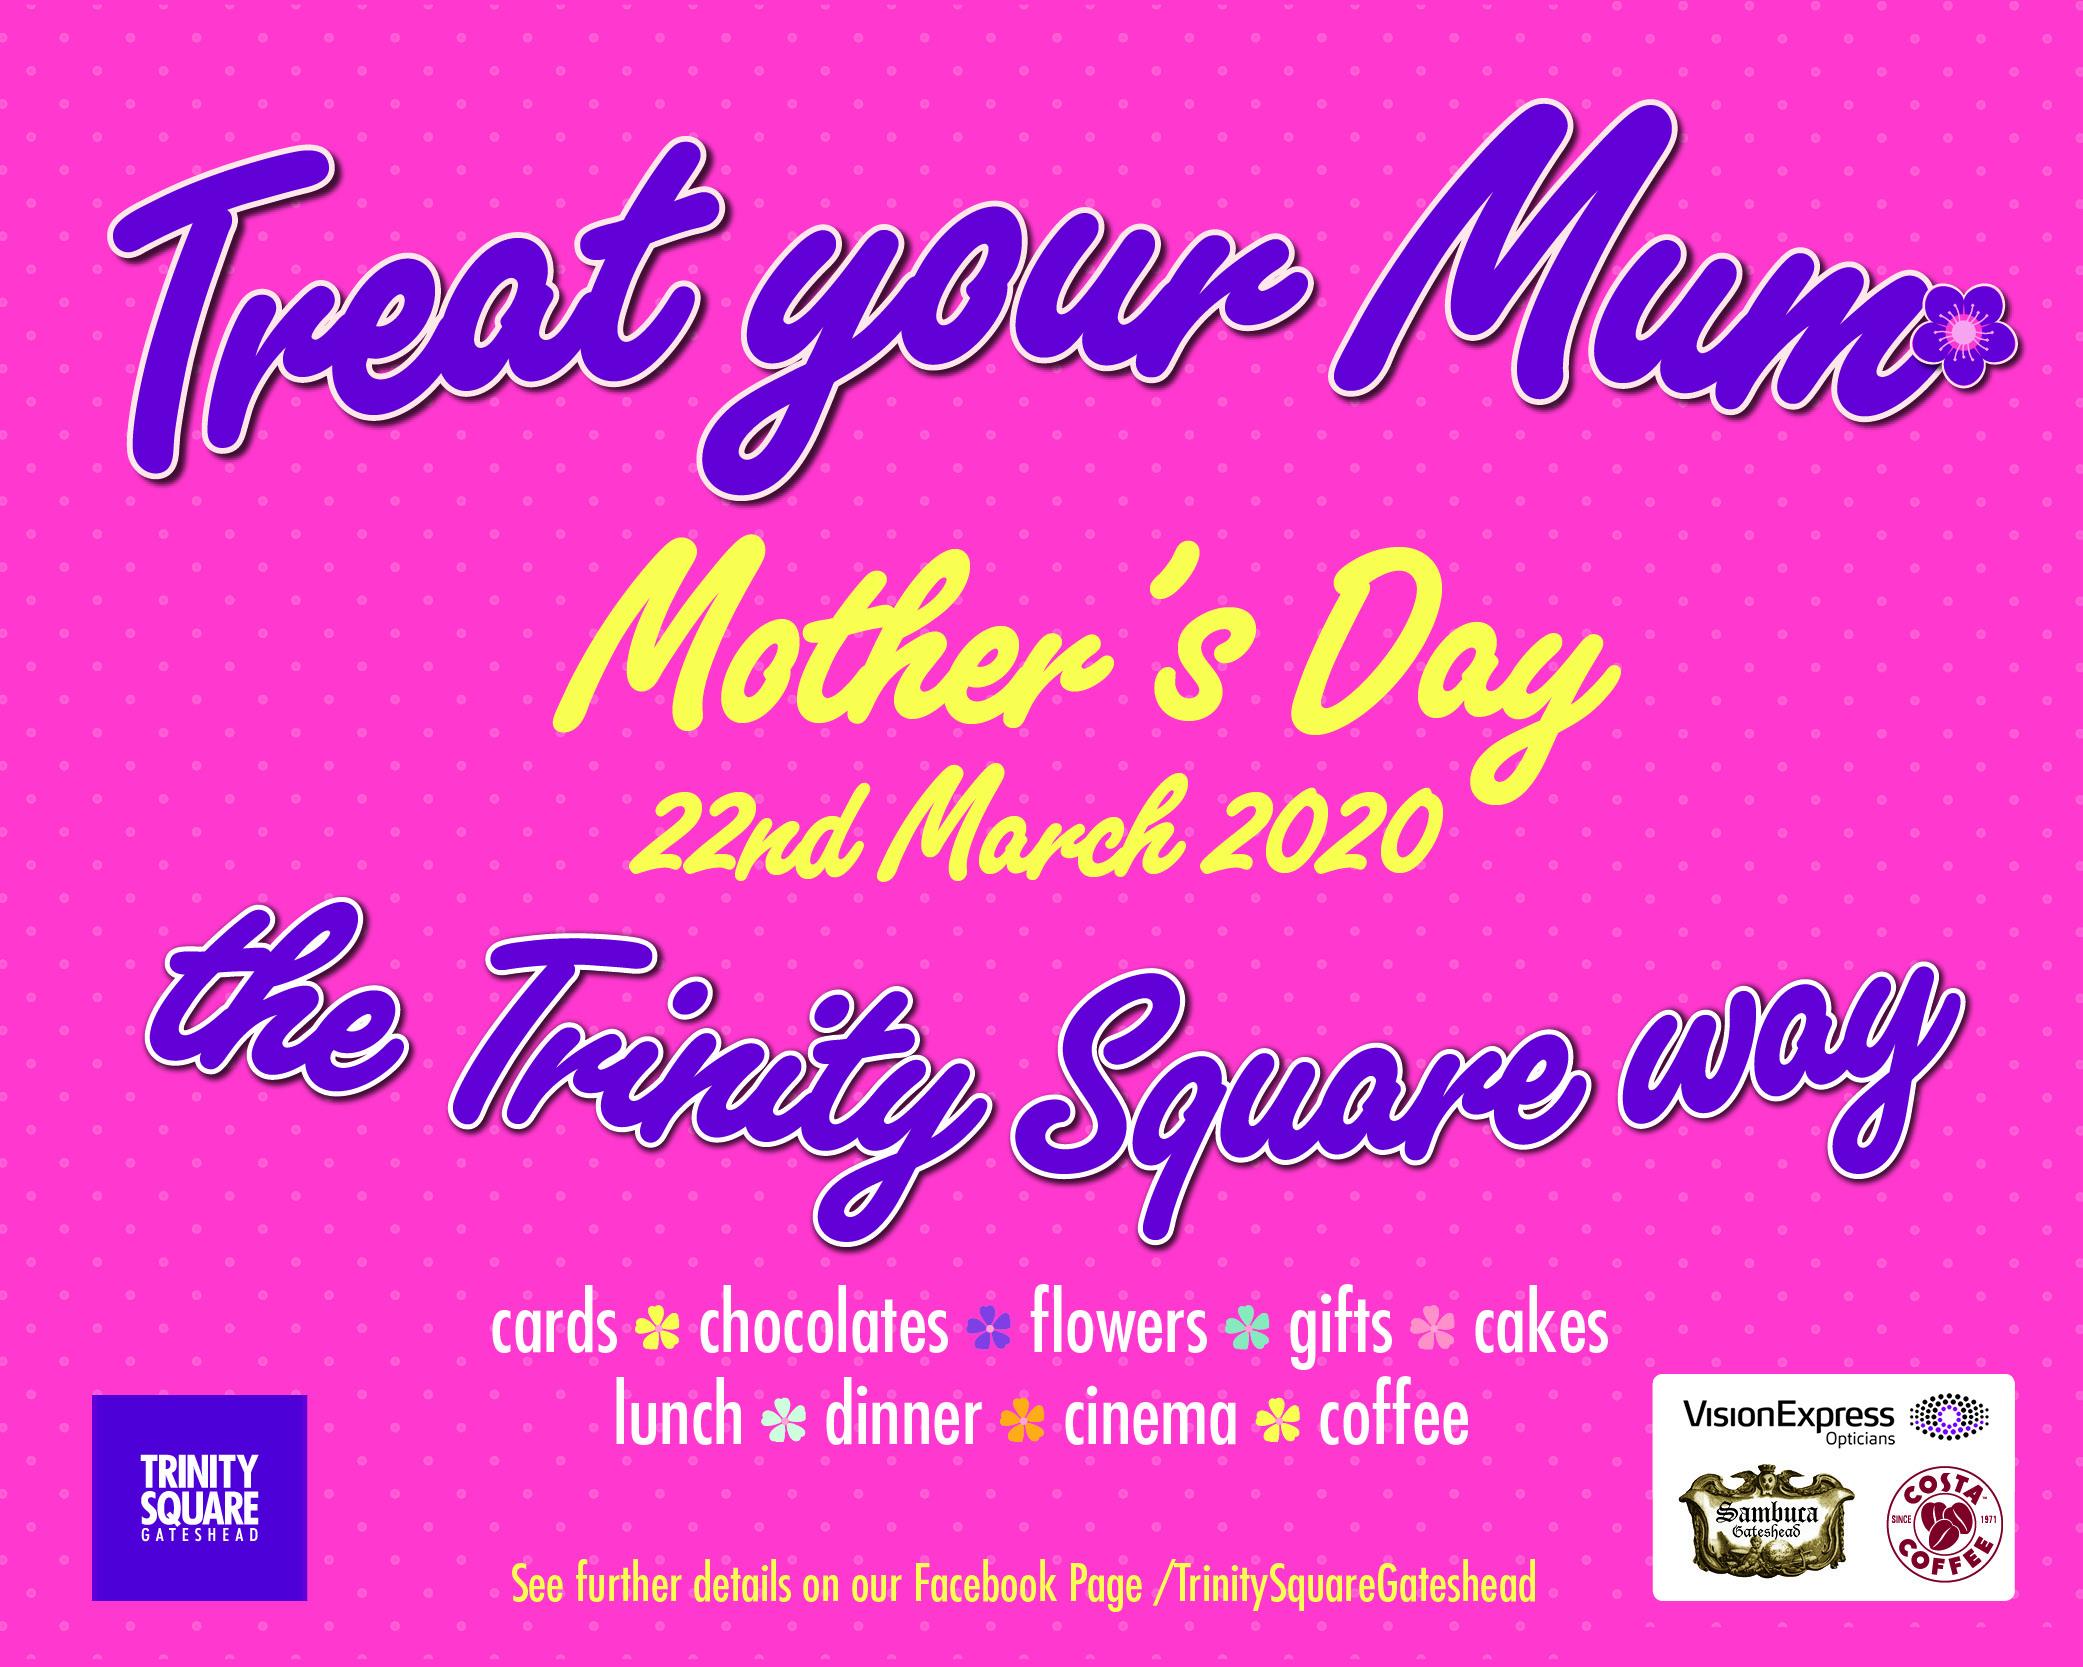 Treat your Mum the Trinity Square Way!